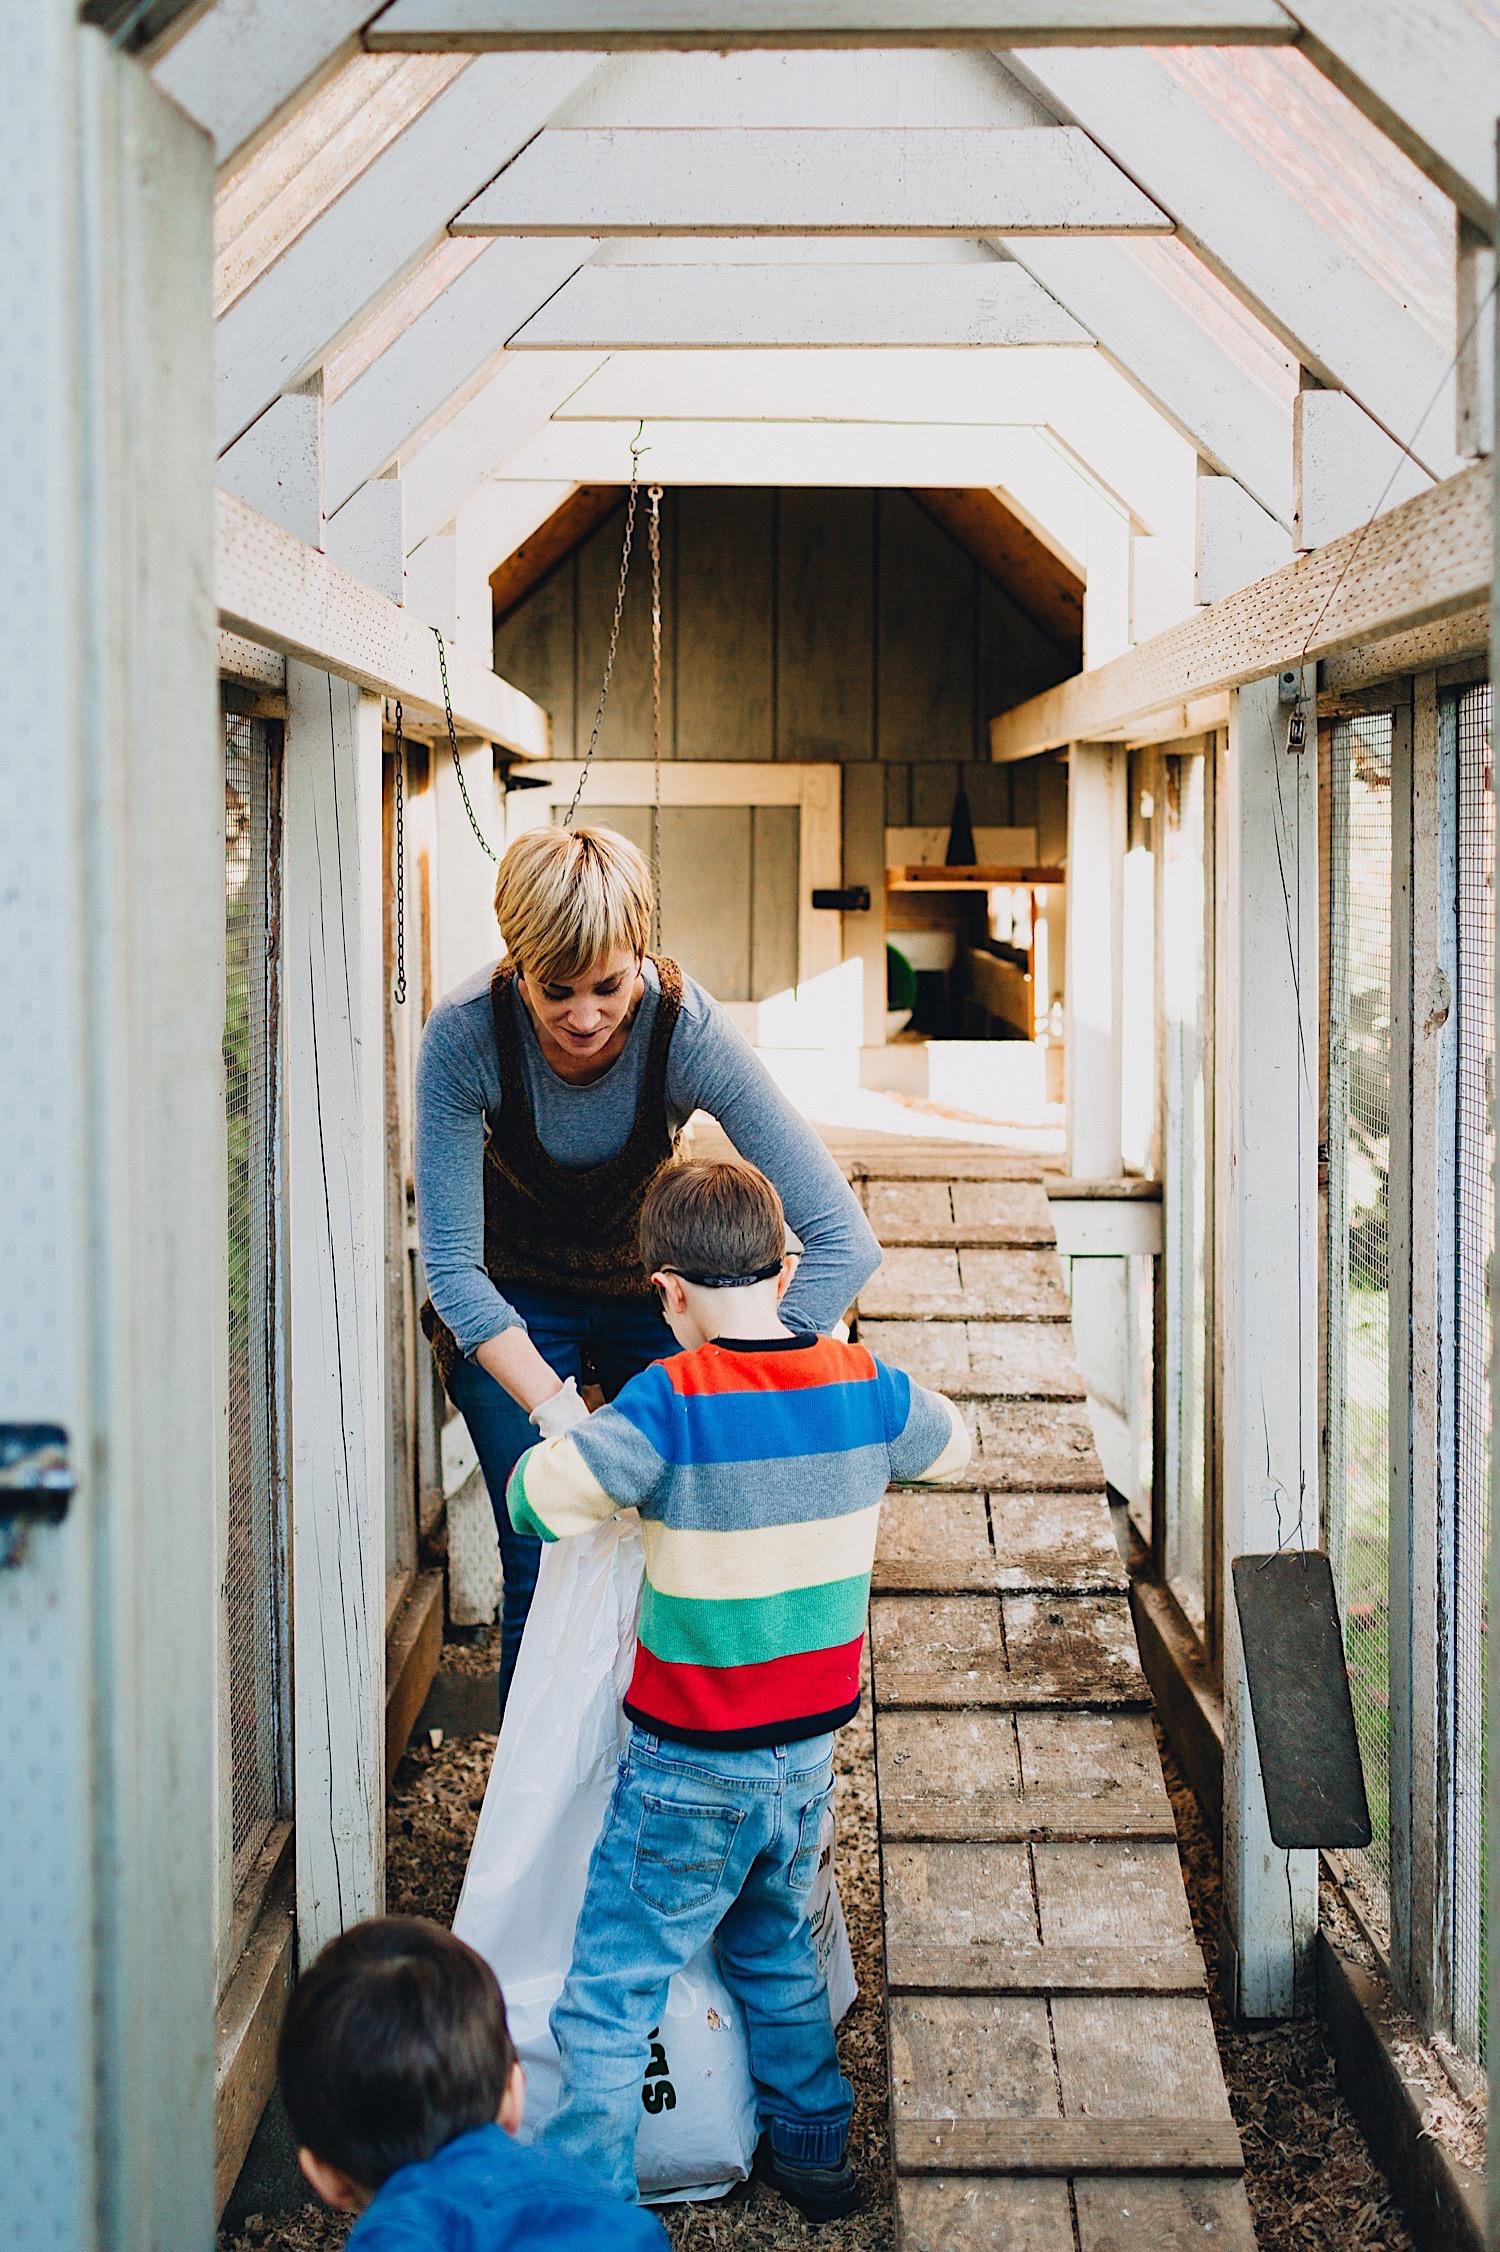 06_Photos_relaxed_Family_Fun_Photography_Seattle_Shoreline_documentary_Child.jpg